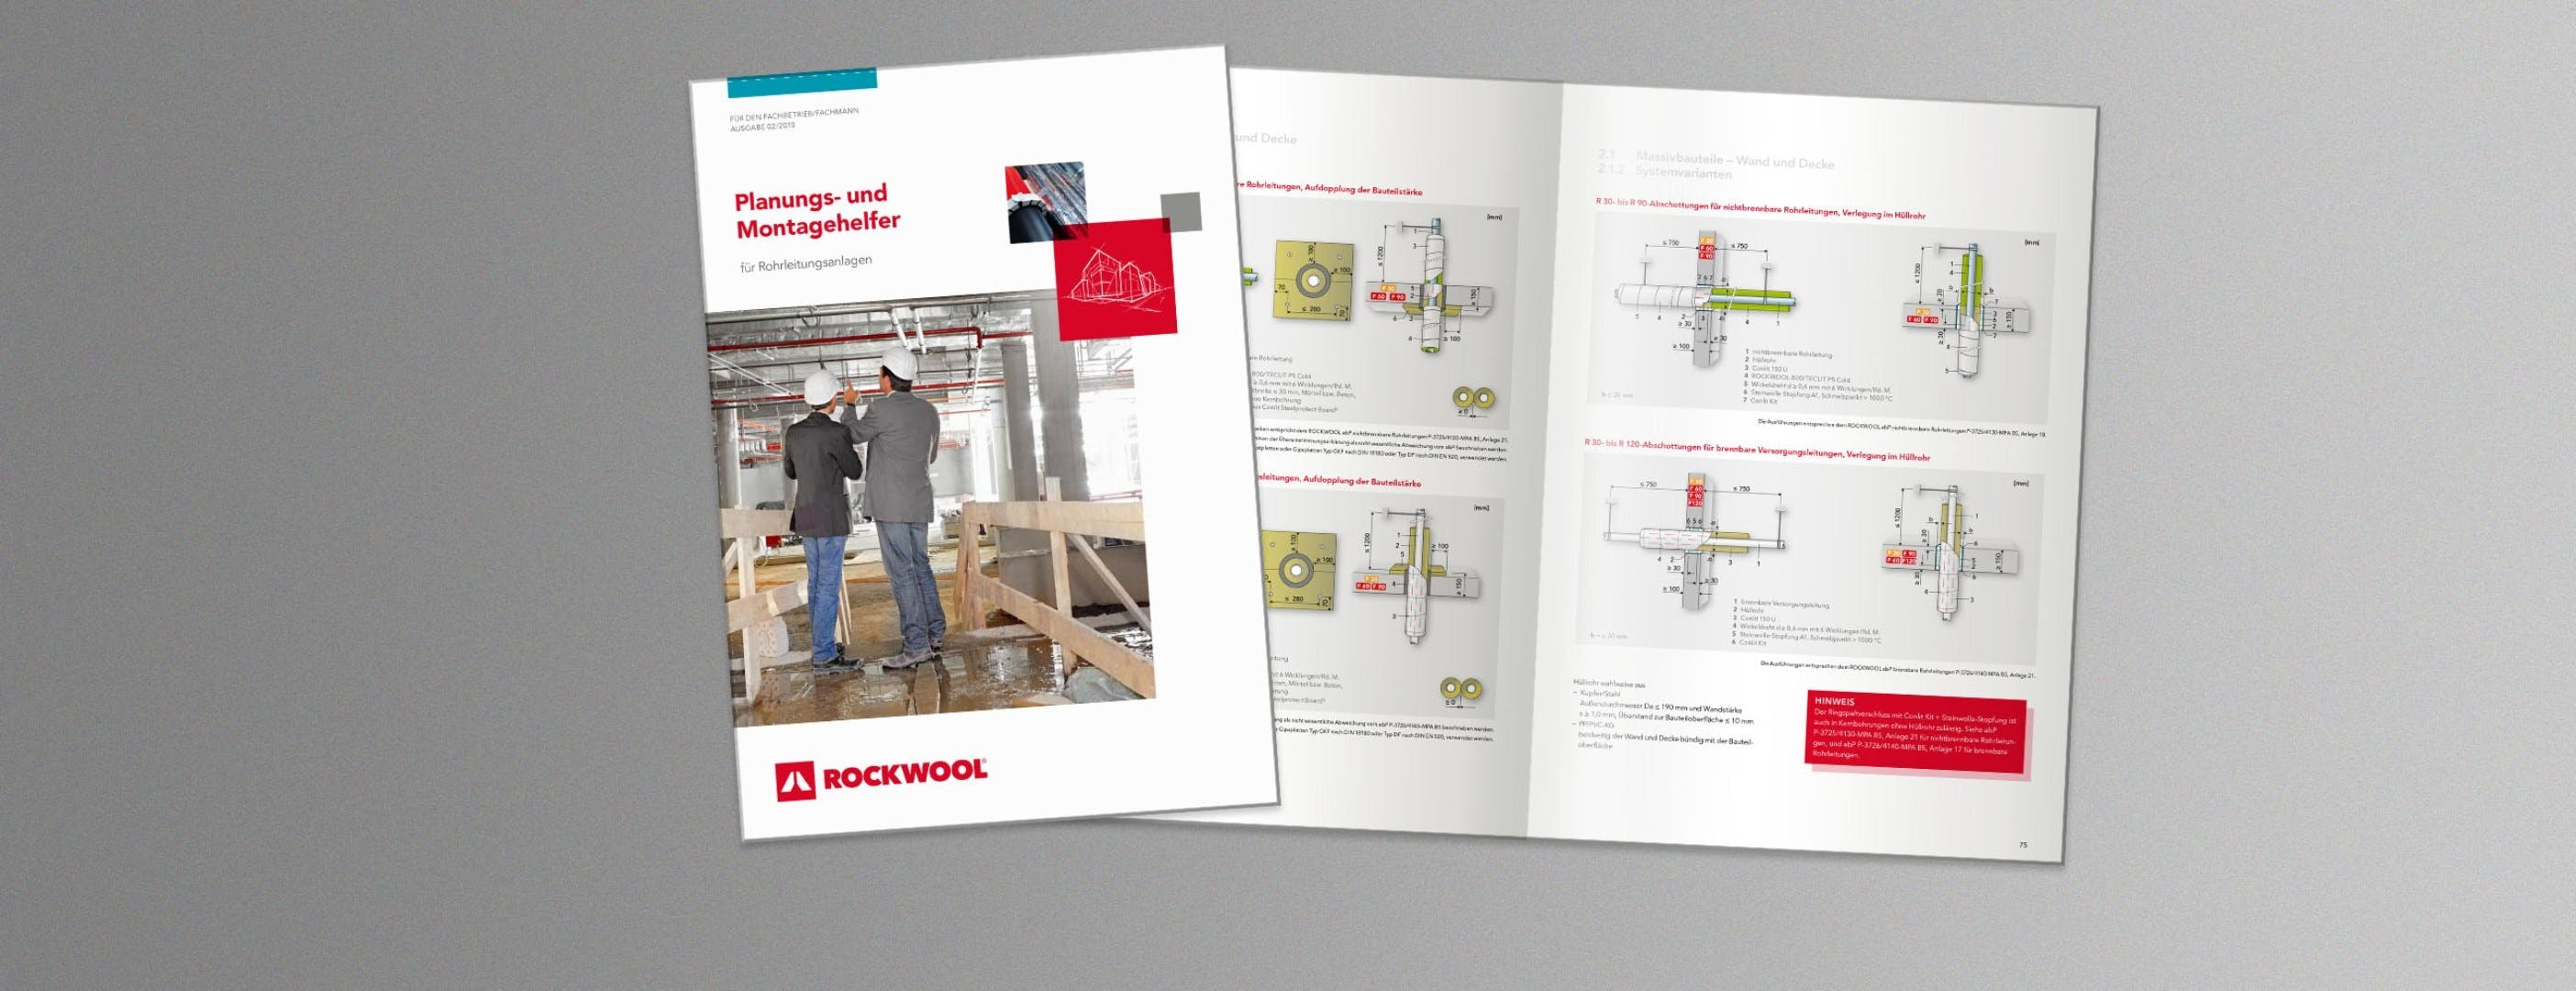 thumbnail, brochure, hvac, planungs-und montagehelfer, germany